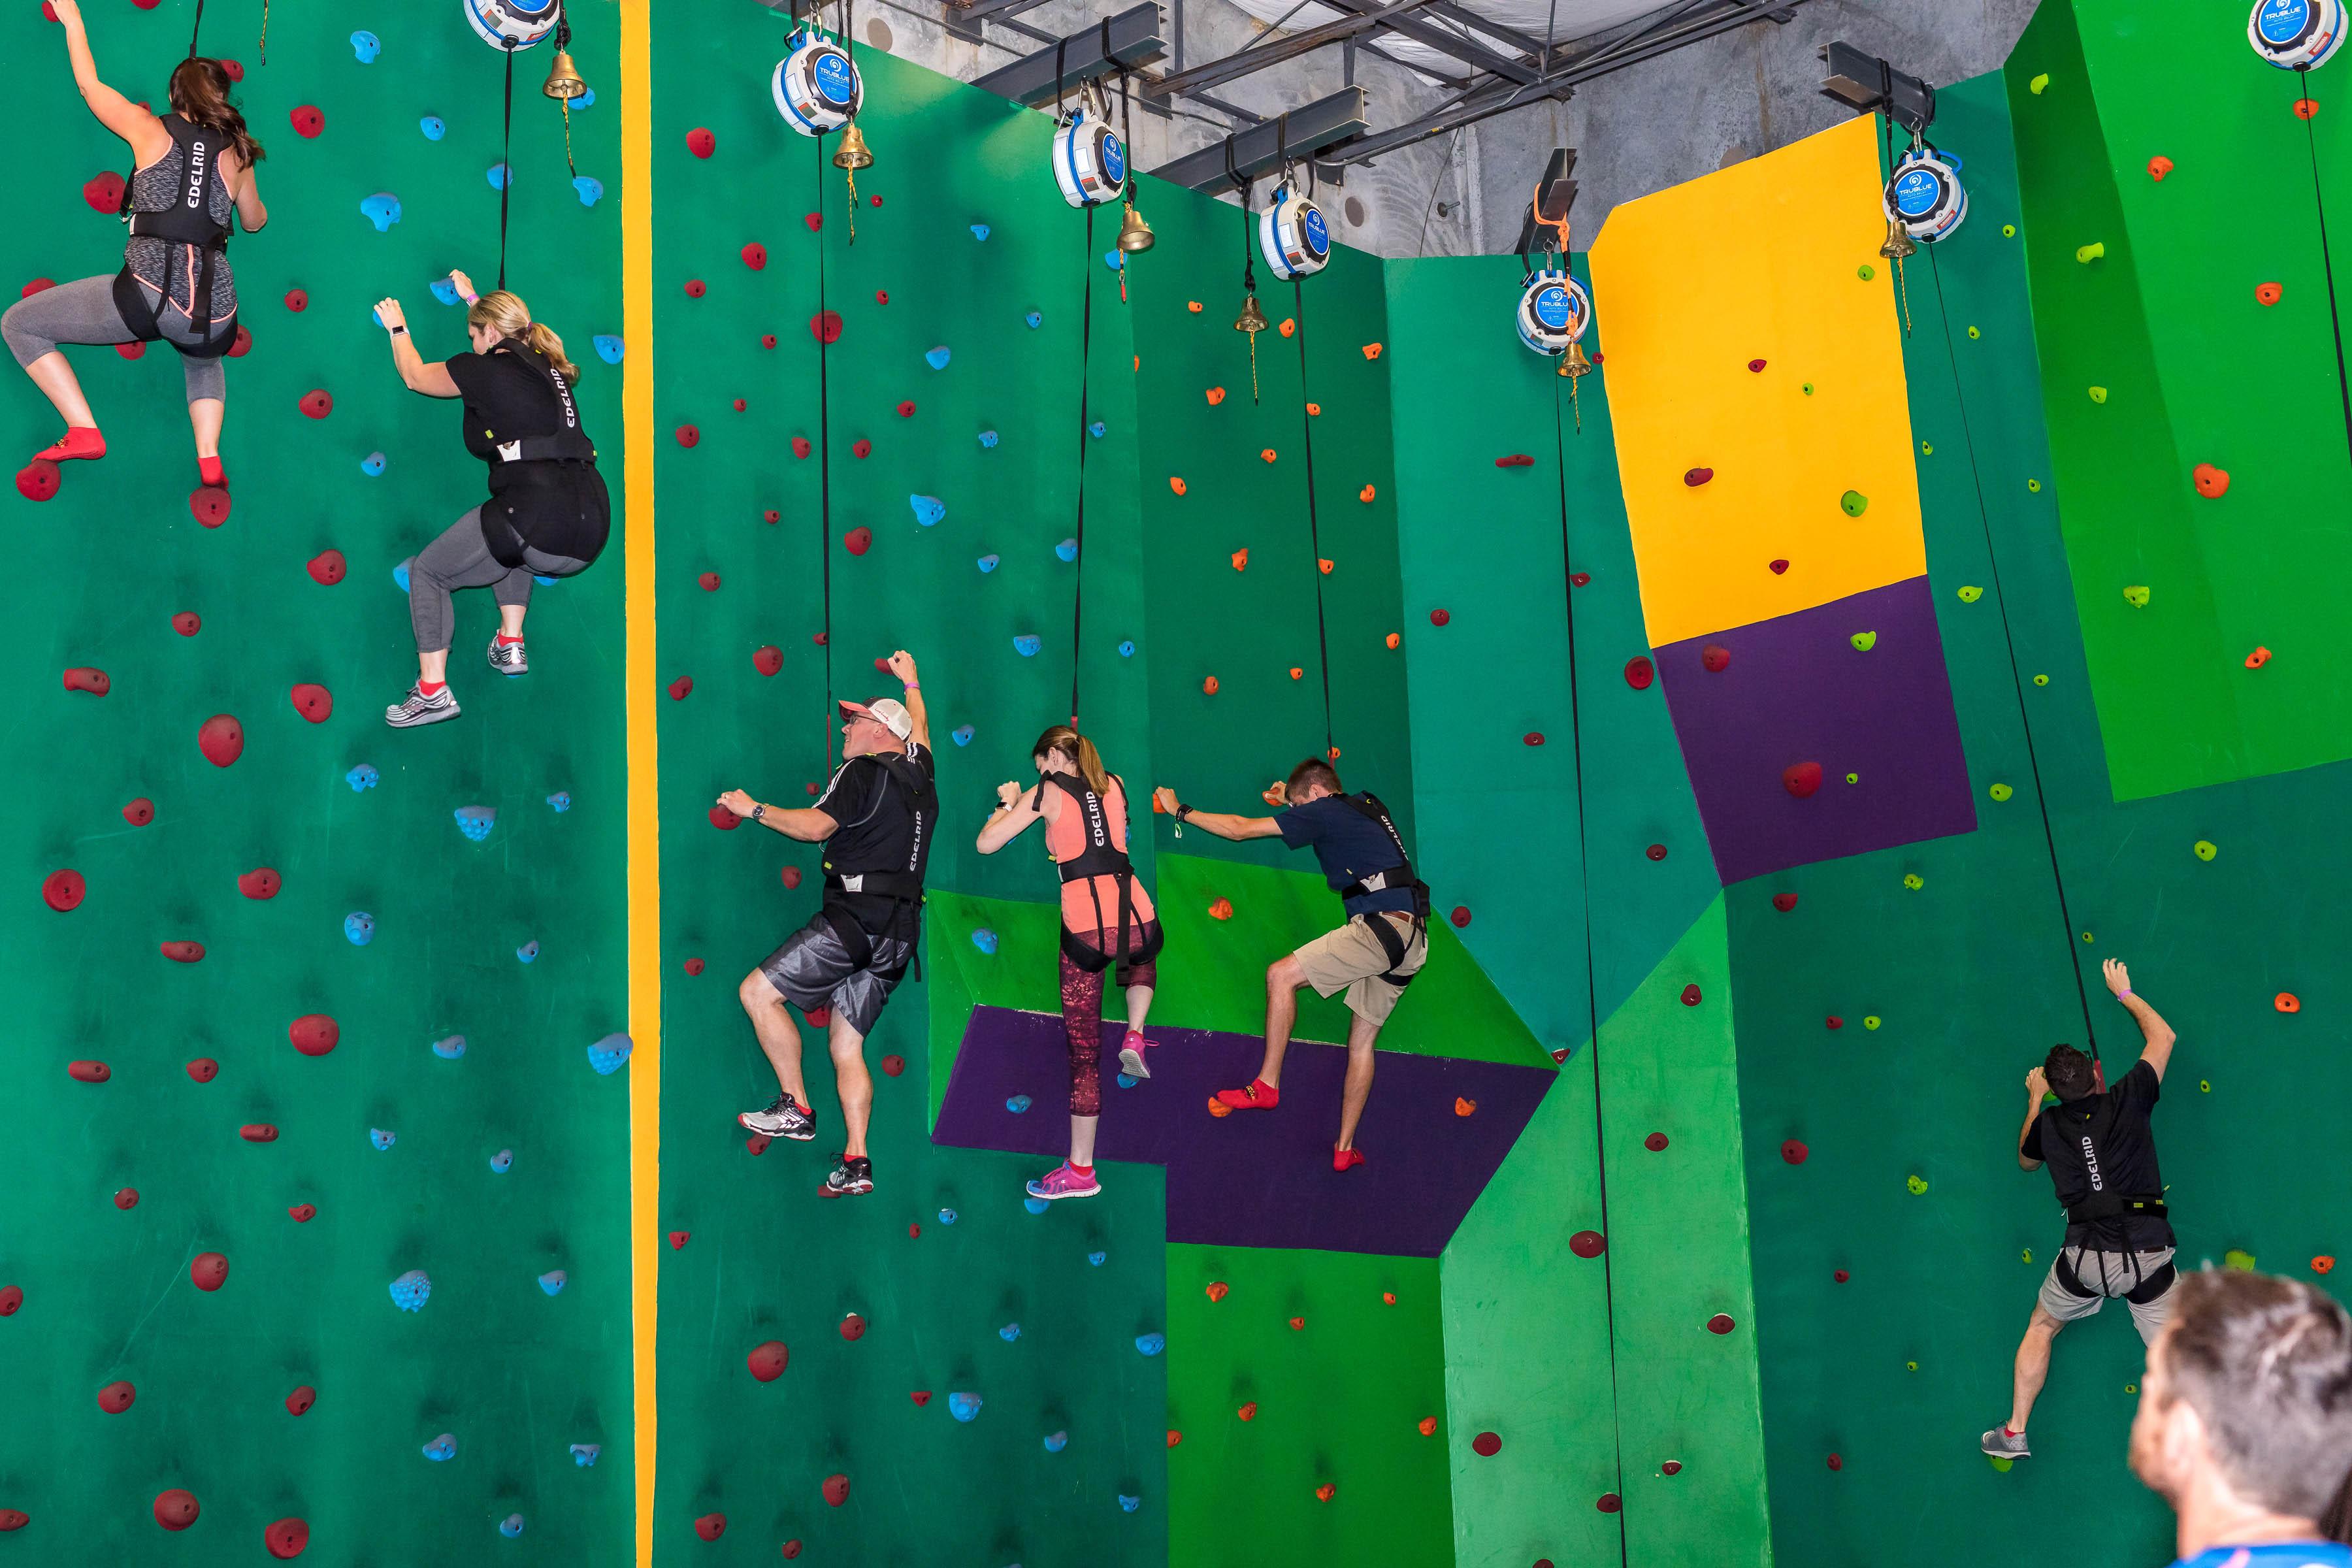 Rock-climbing Wall